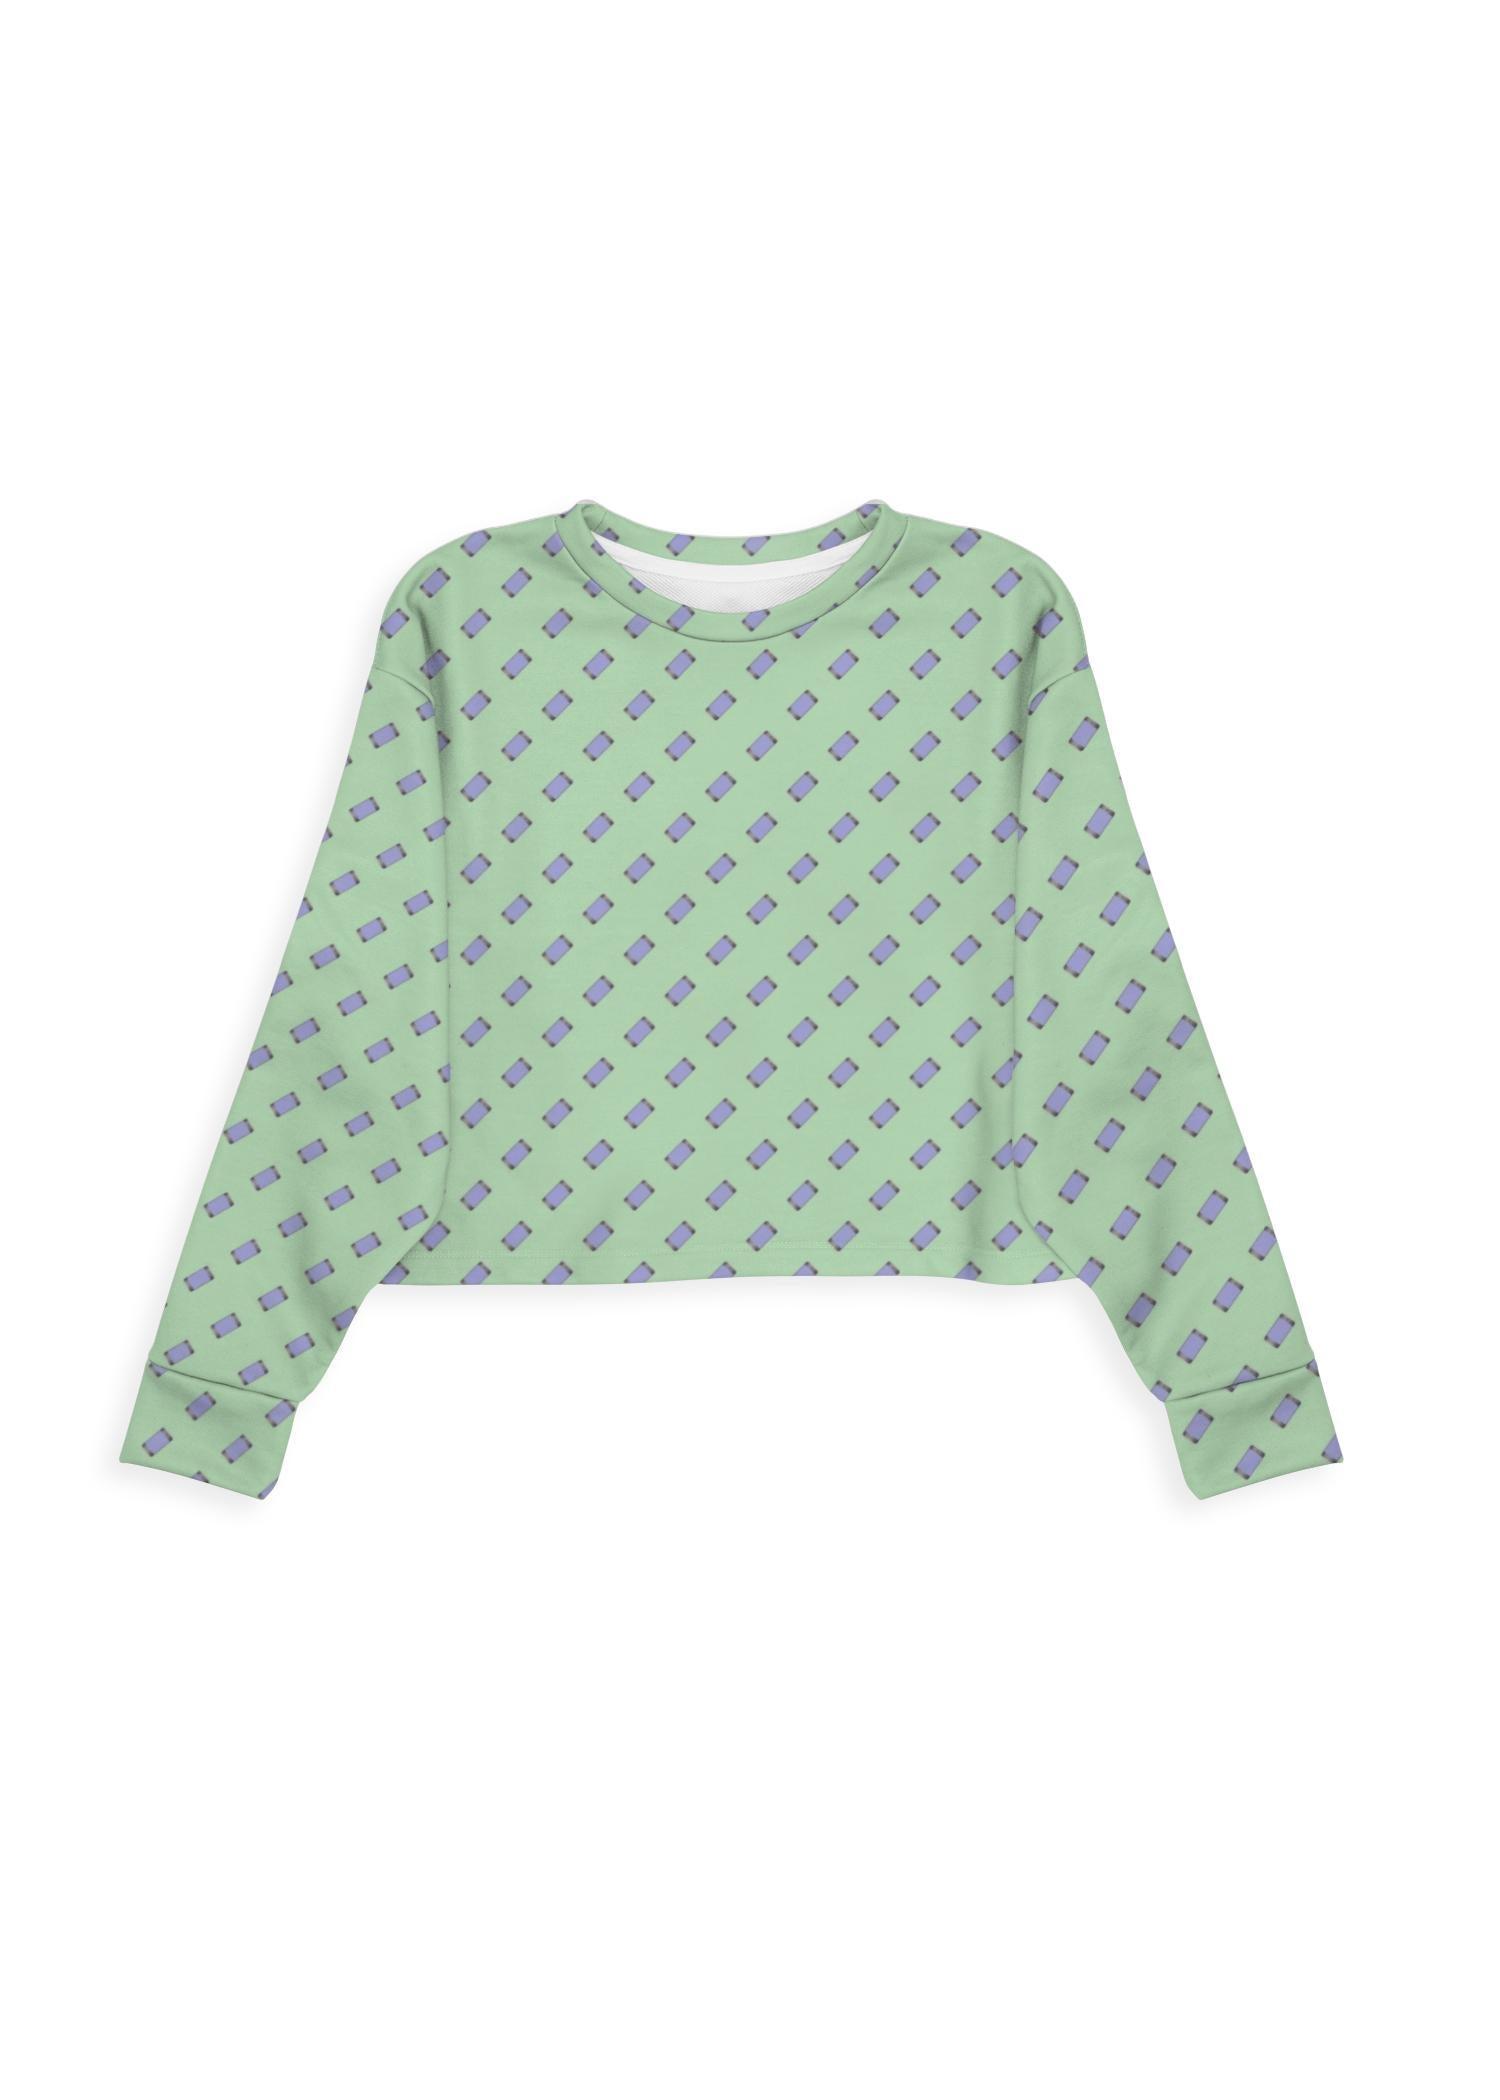 VIDA Modern Eco Sweatshirt - Mobile Phones On Green in Green by VIDA Original Artist  - Size: Extra Large